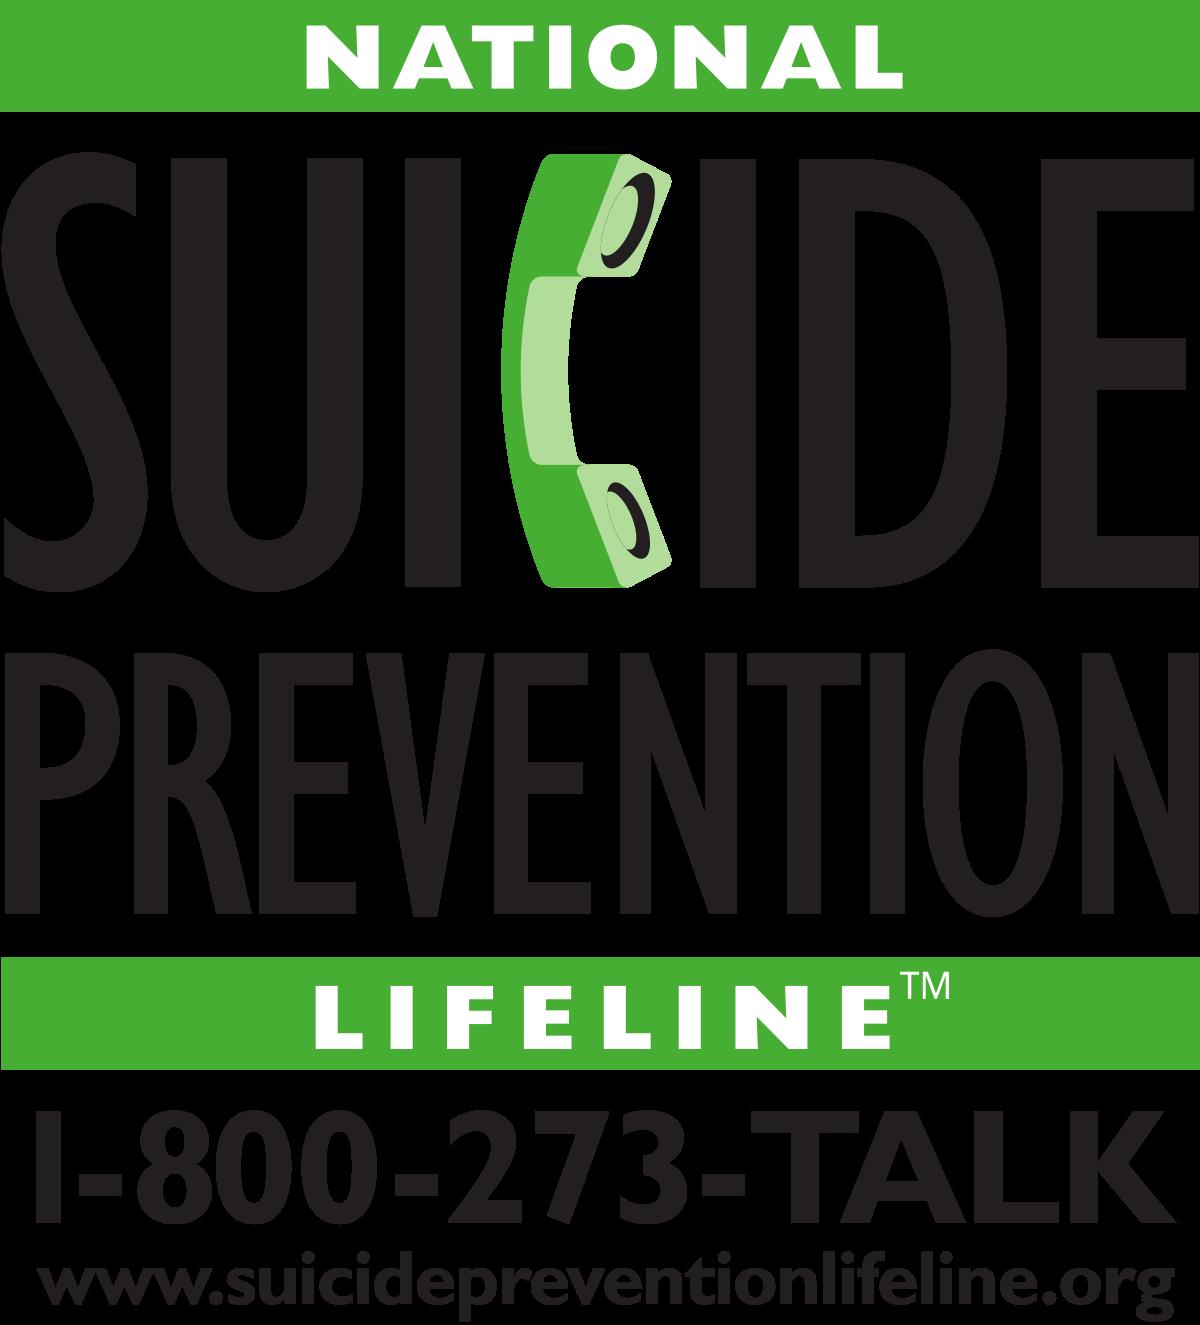 Suicide prevent line